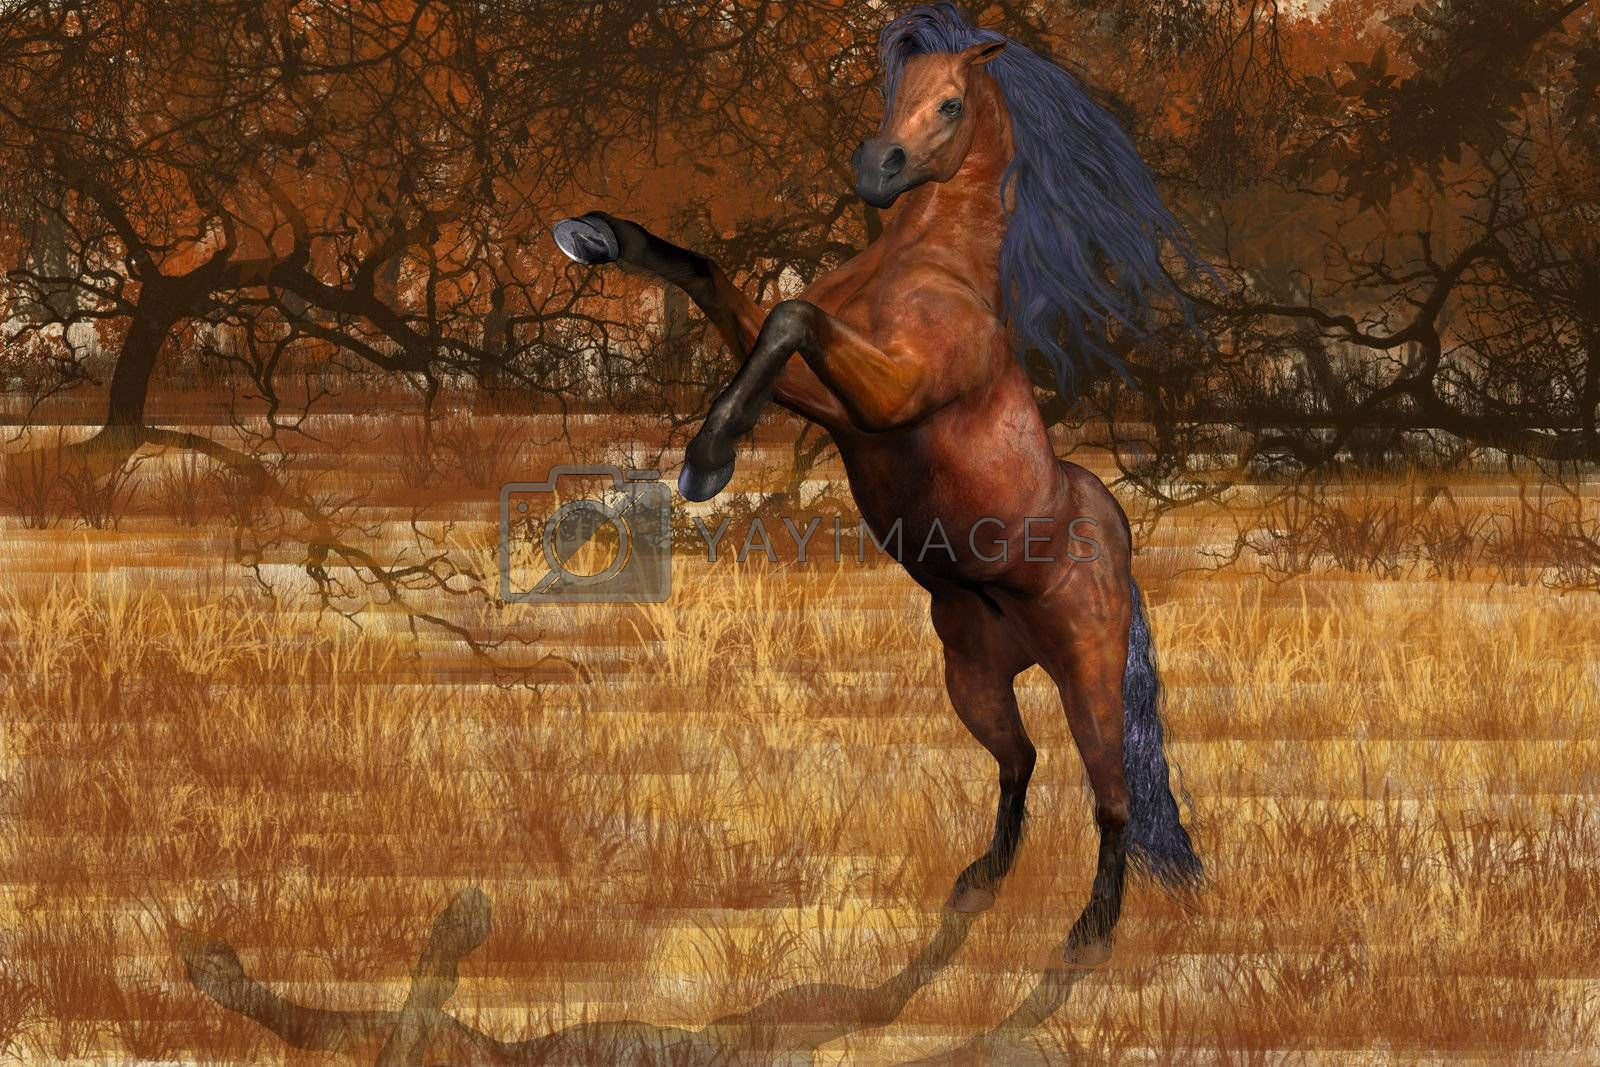 An beautiful Arabian stallion rears up feeling frisky in the colors of autumn.